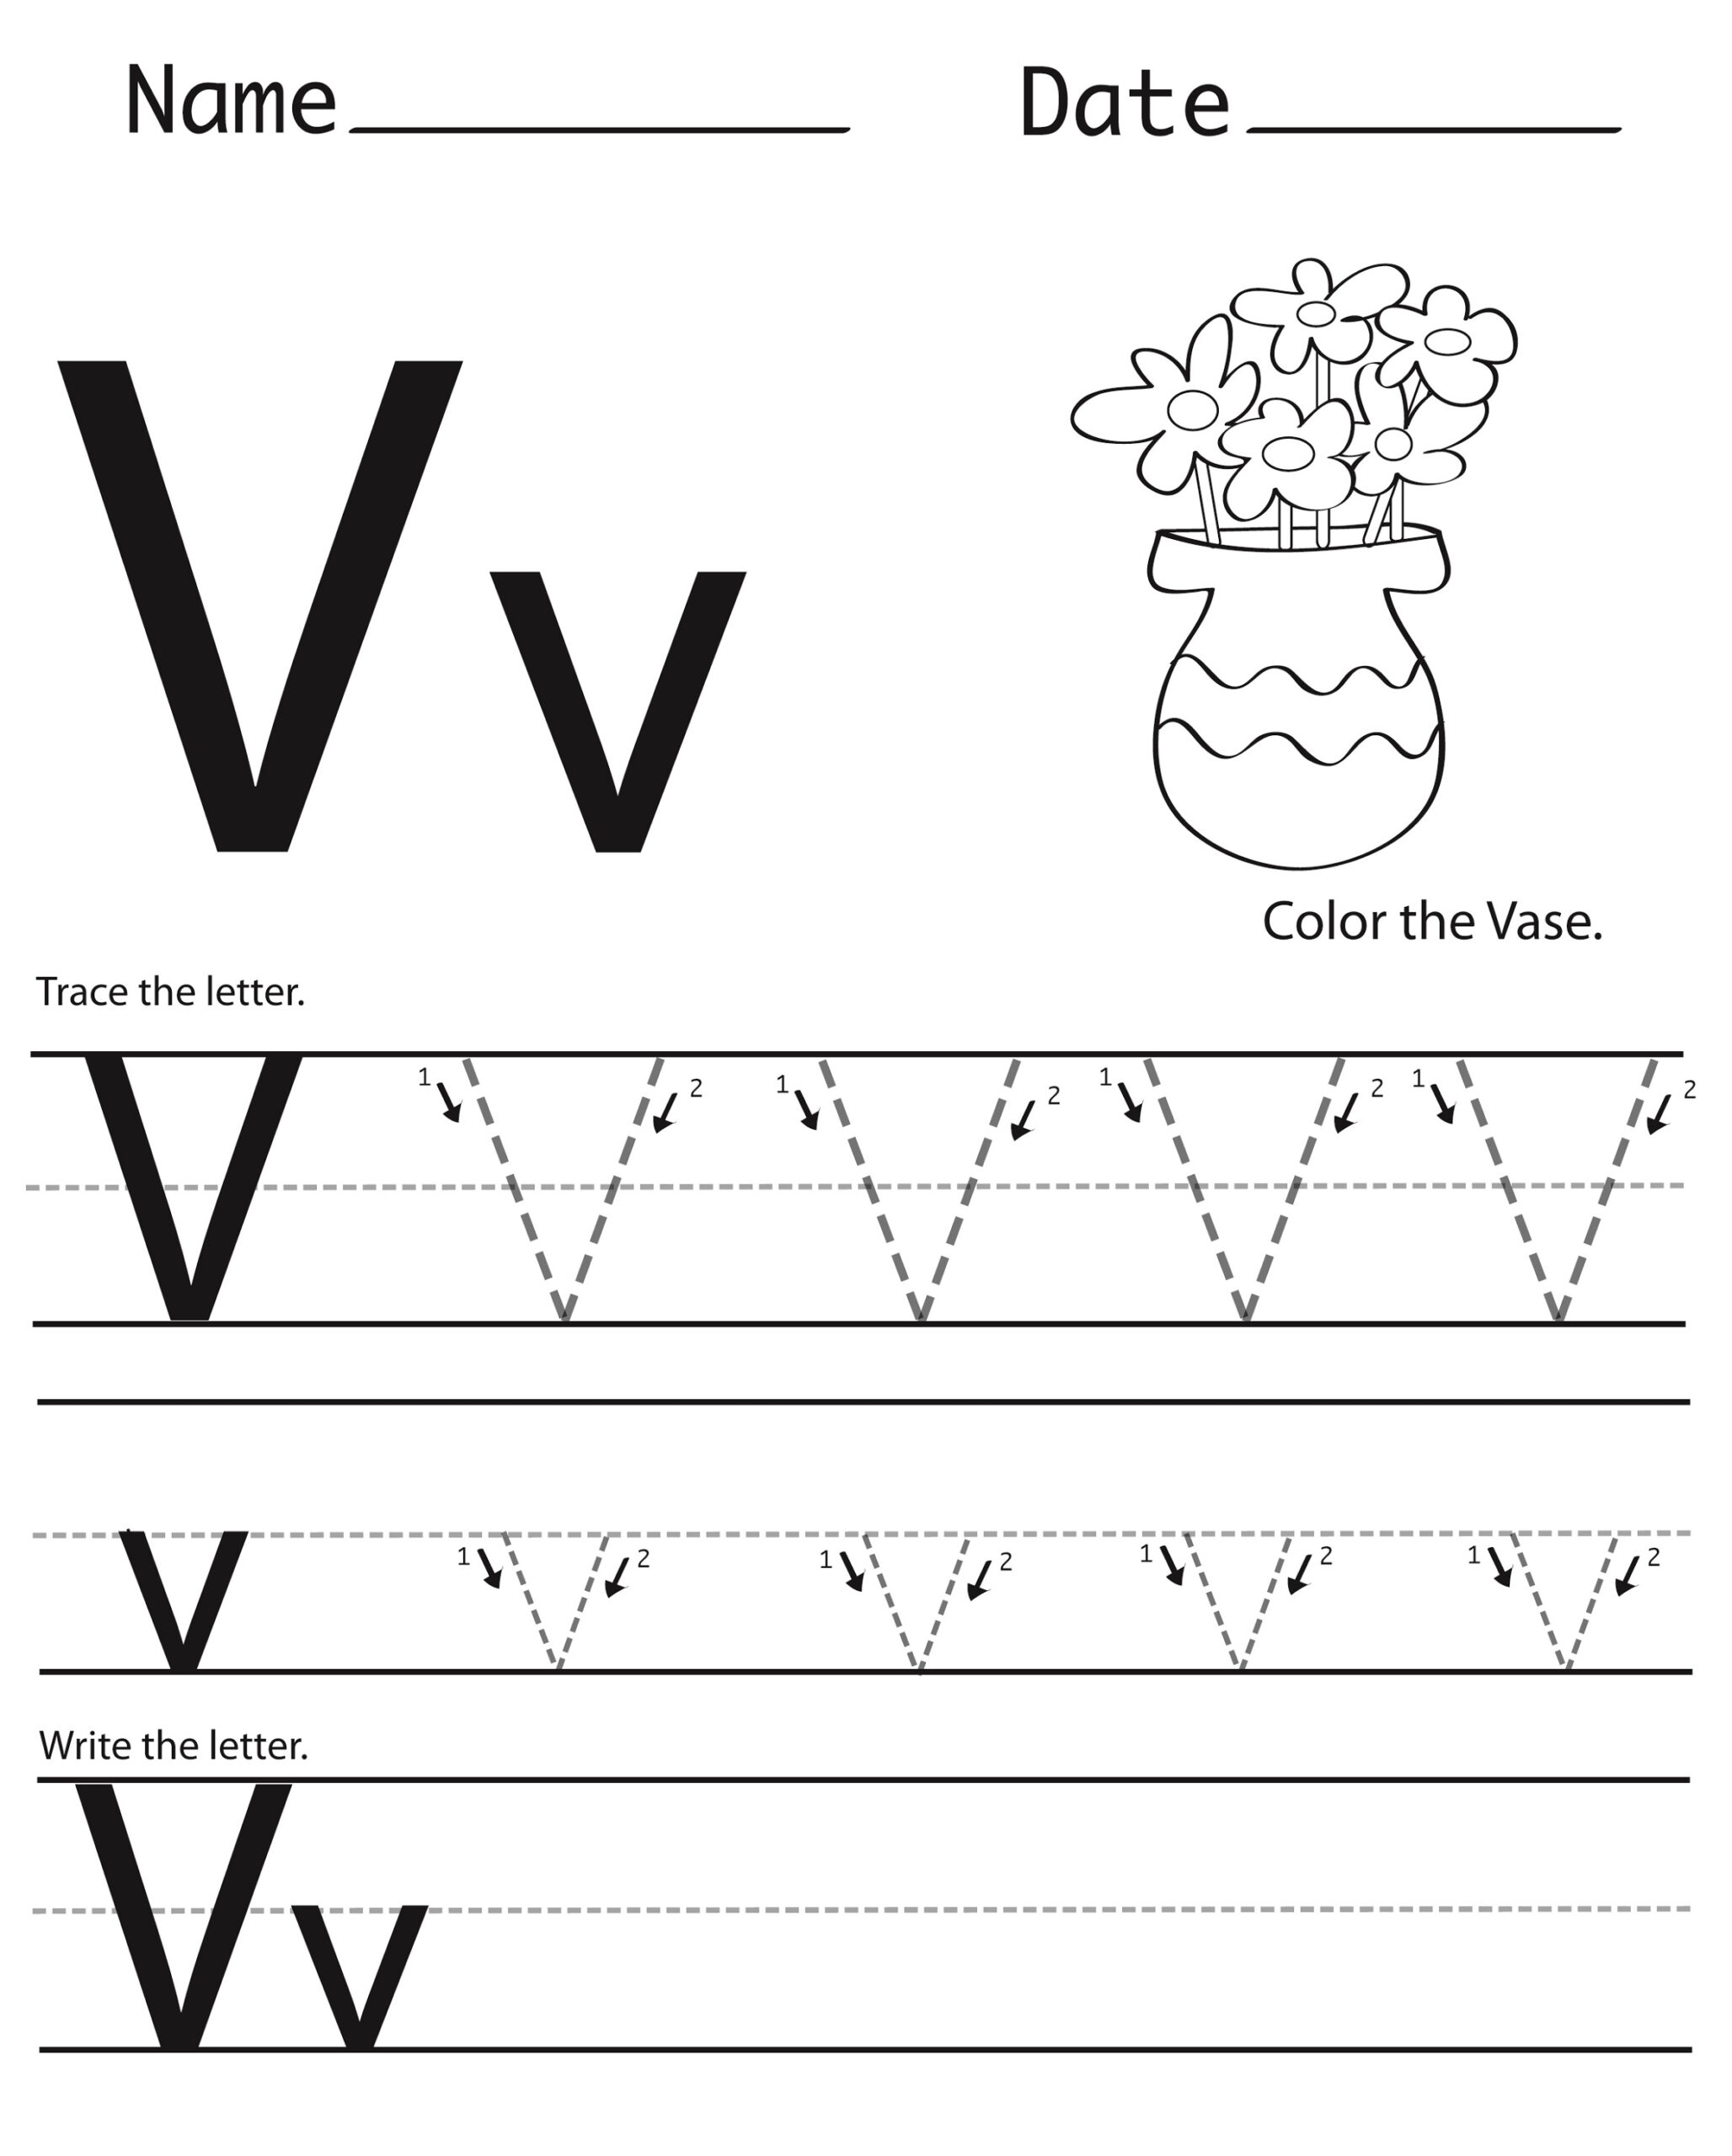 Letter V Worksheets To Print   Activity Shelter regarding Letter V Tracing Preschool